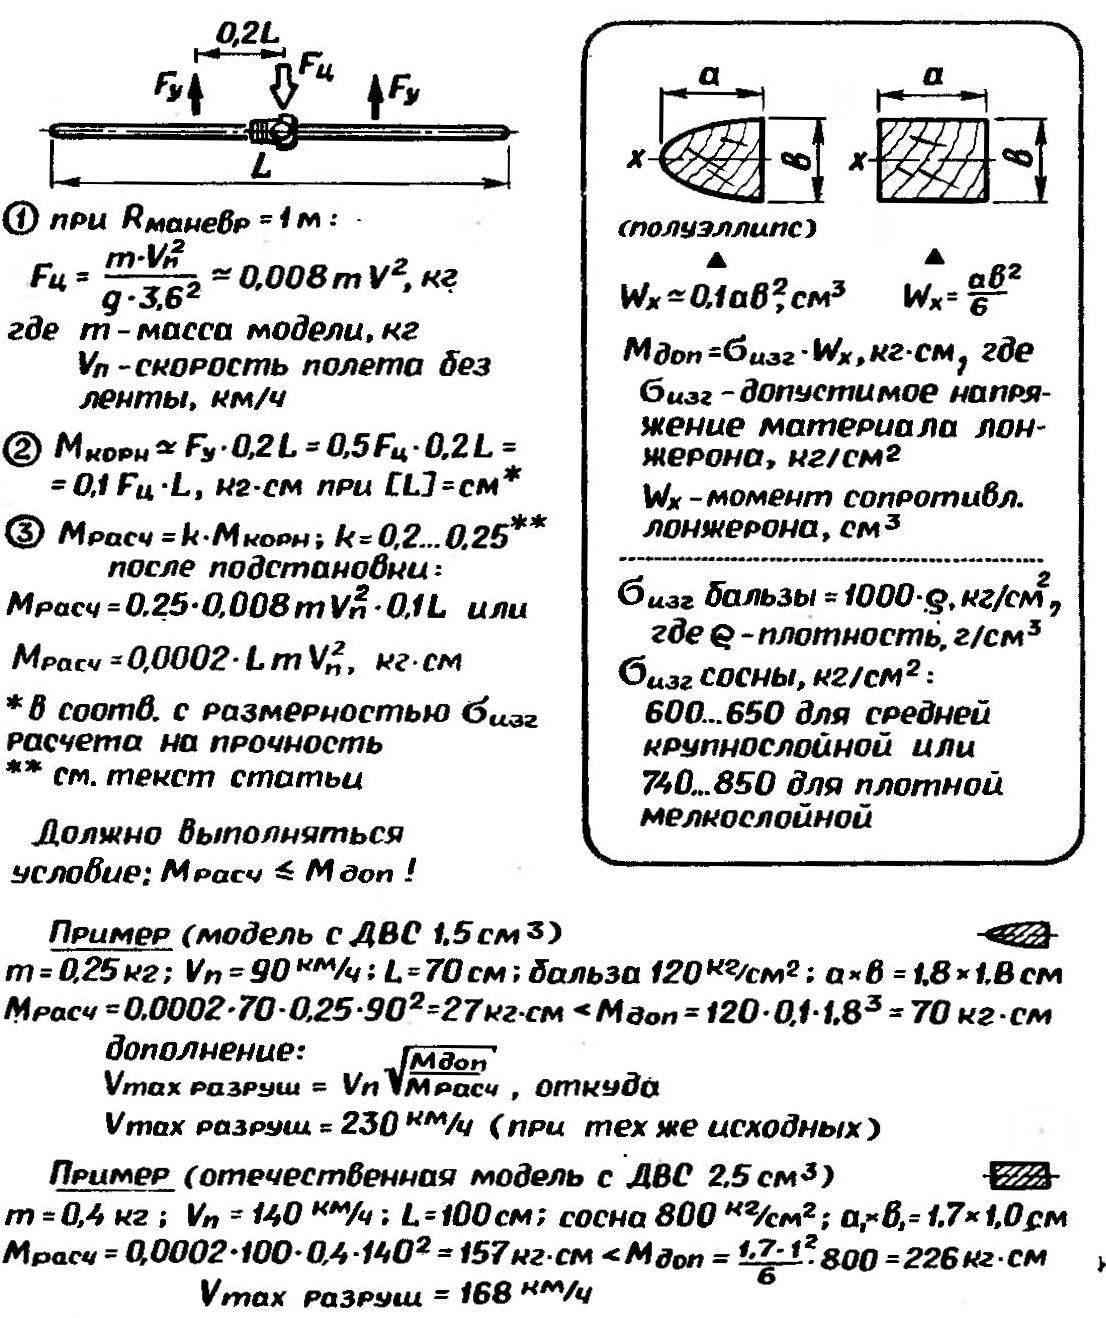 Рис. 4. Методика расчета силовой передней монокромки на прочность и на изгиб